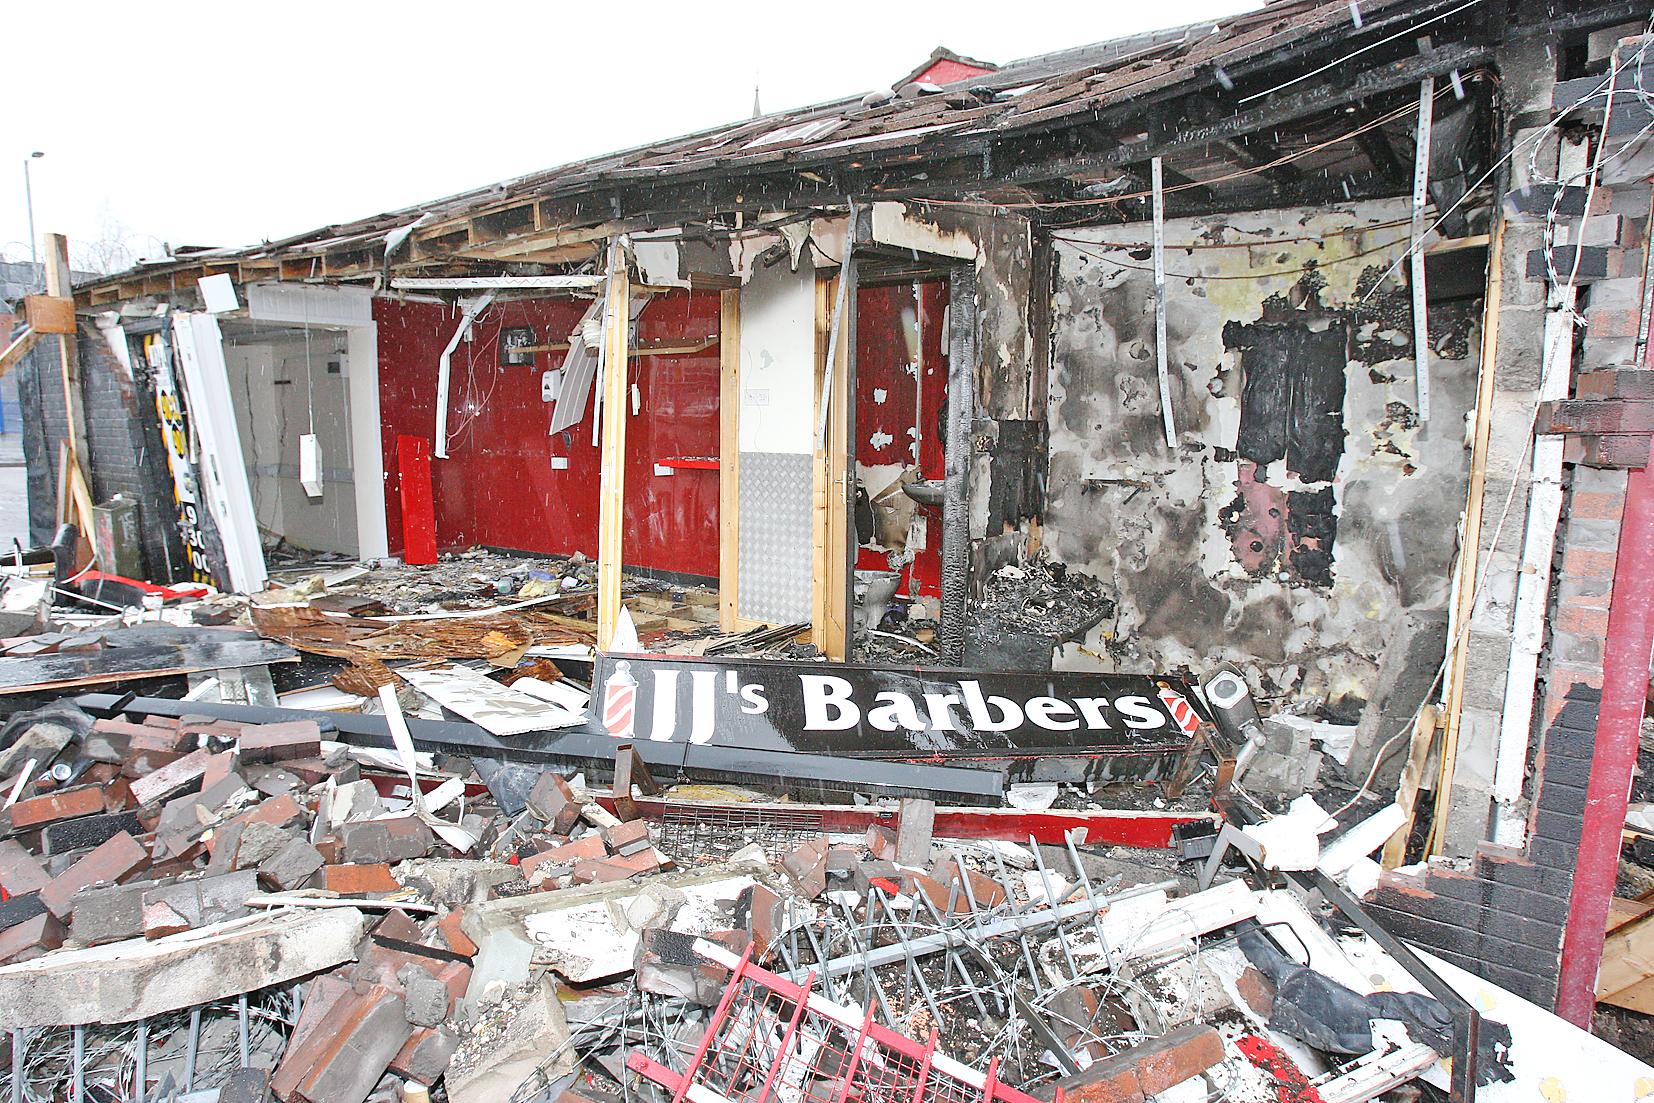 A2b cabs jj barbers shop destroyed 1114mj16